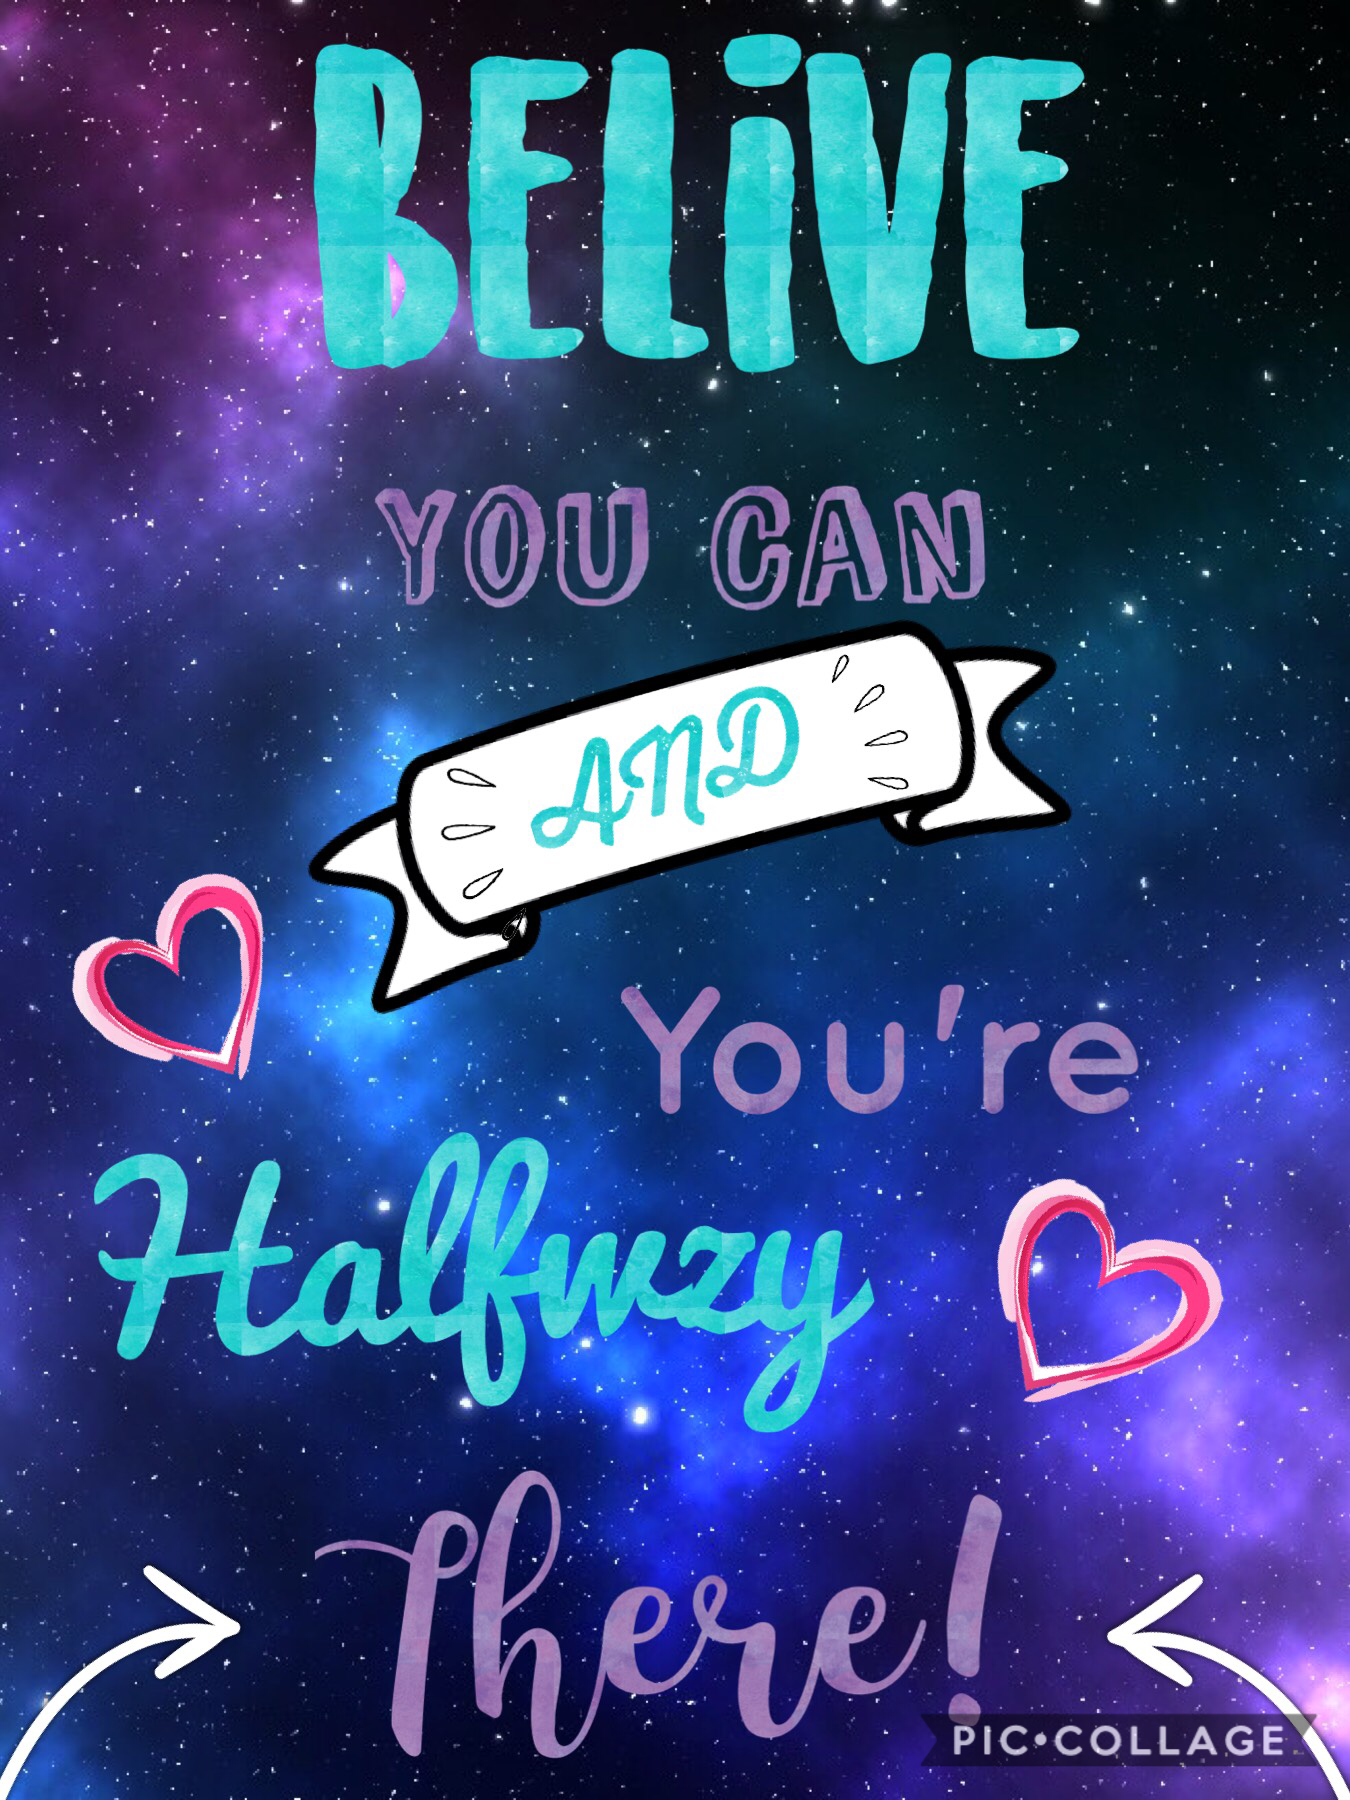 Tap. 🐰 So motivational, so inspiring!